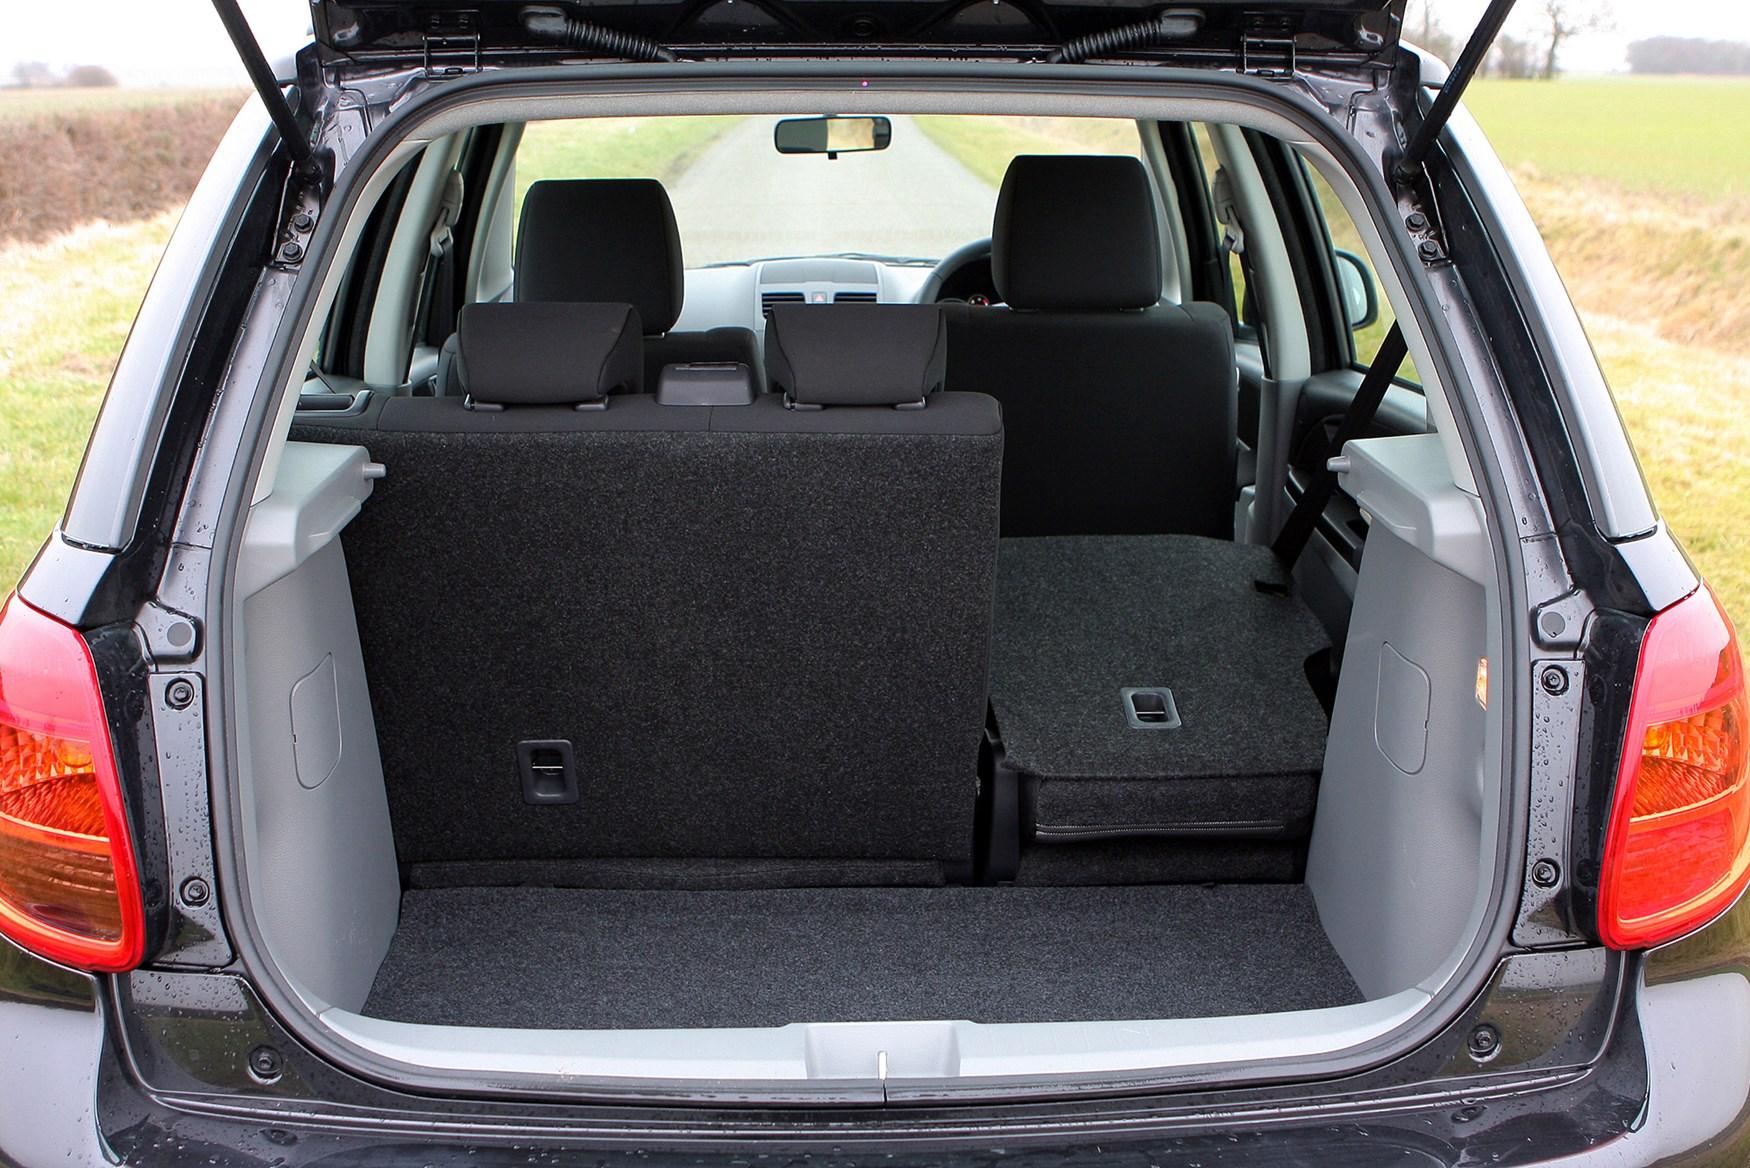 Suzuki Sx Sedan Boot Space